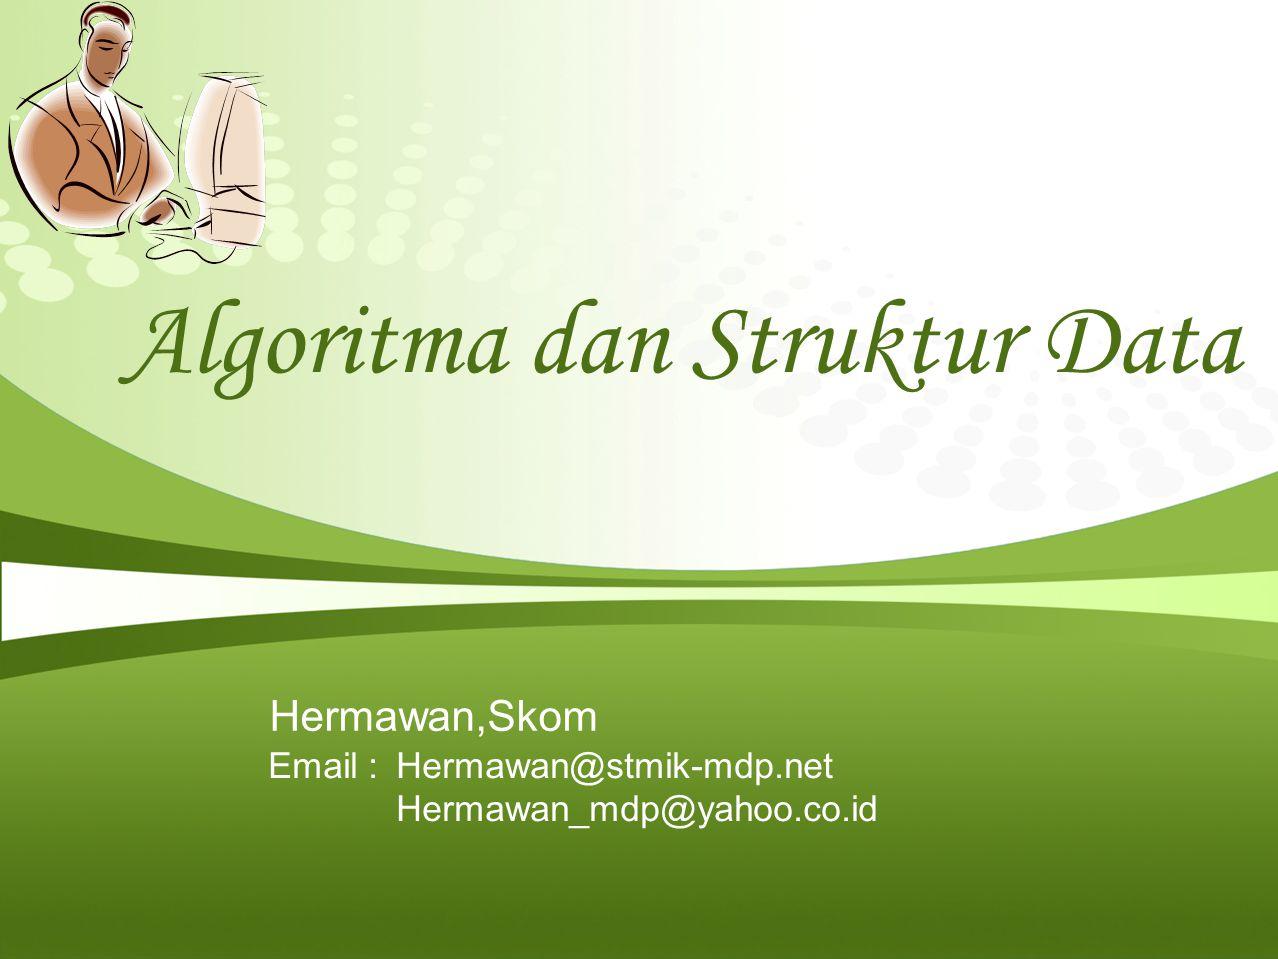 Algoritma dan Struktur Data Hermawan,Skom Email : Hermawan@stmik-mdp.net Hermawan_mdp@yahoo.co.id